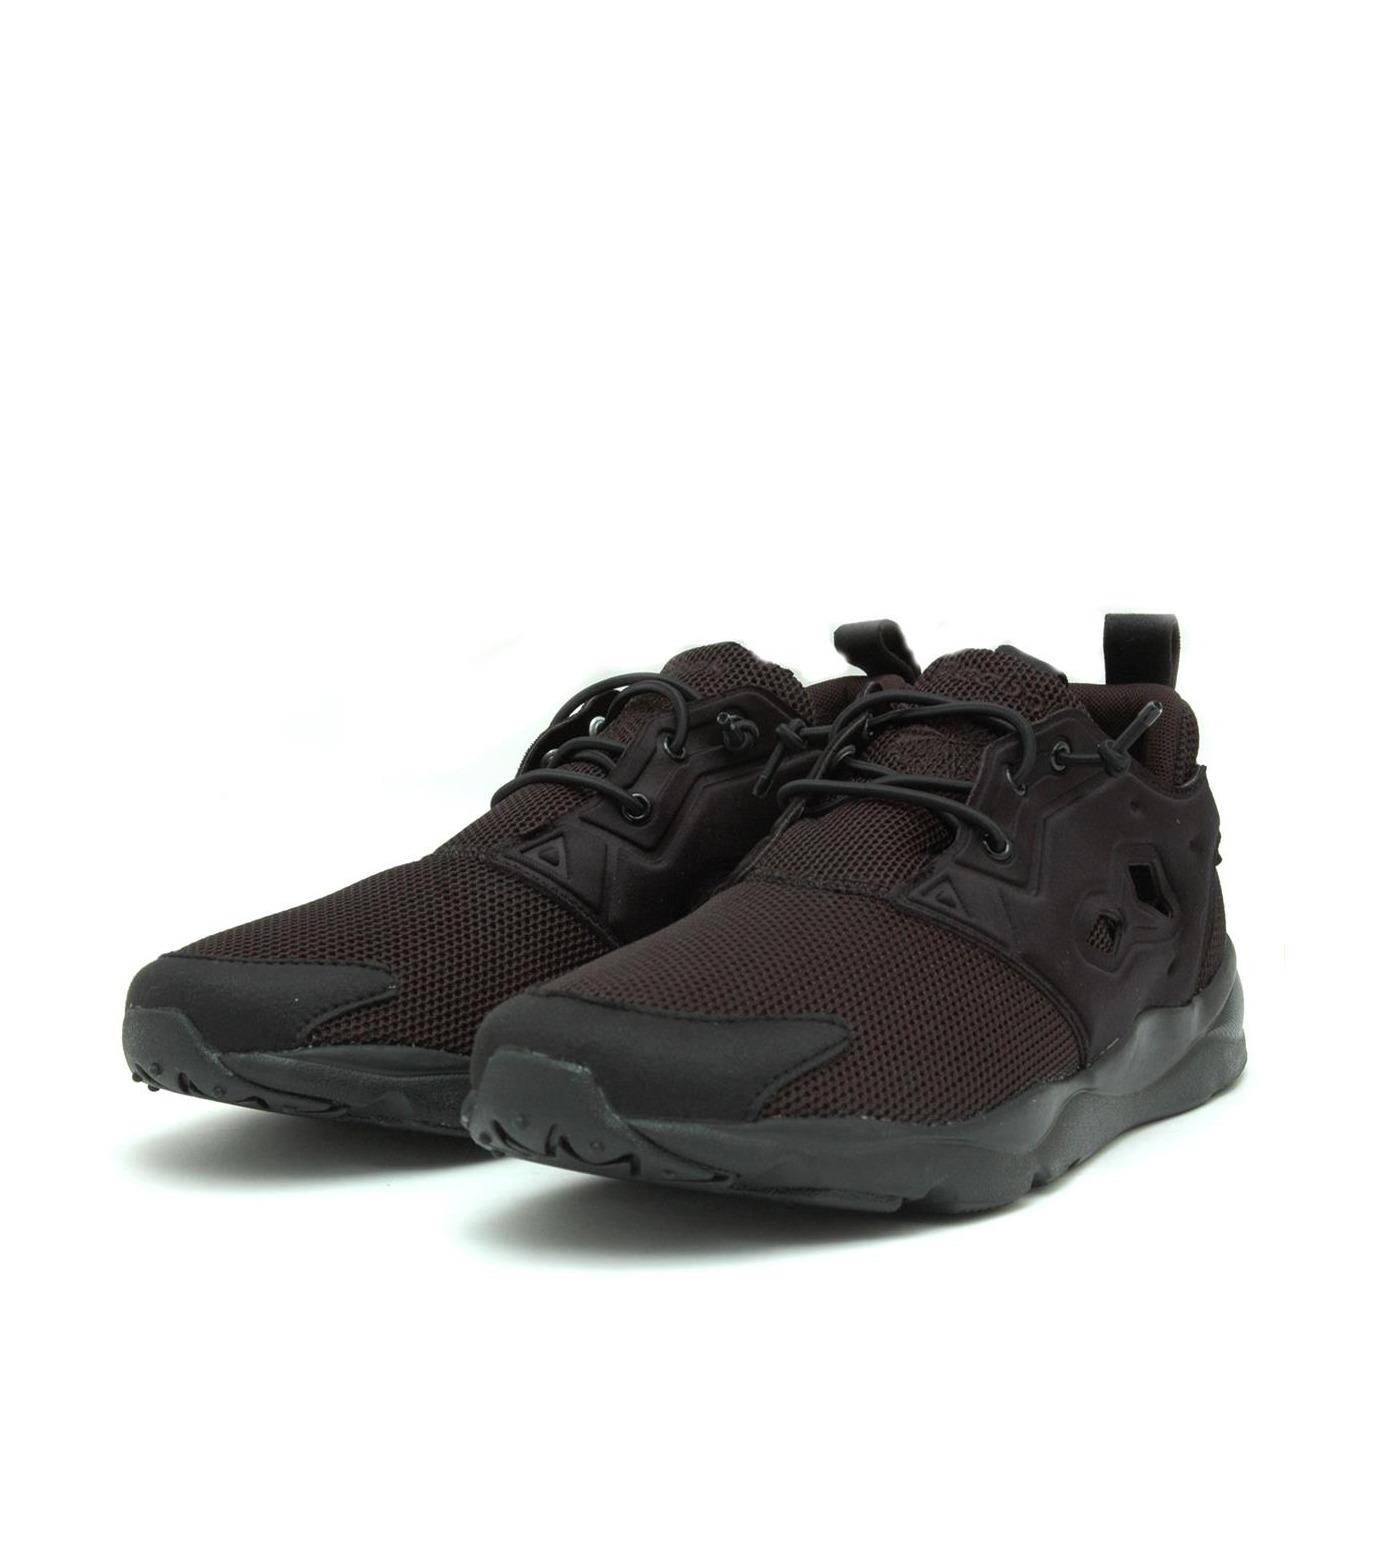 Reebok(リーボック)のFURYLITE-BLACK(シューズ/shoes)-V67159-13 拡大詳細画像3